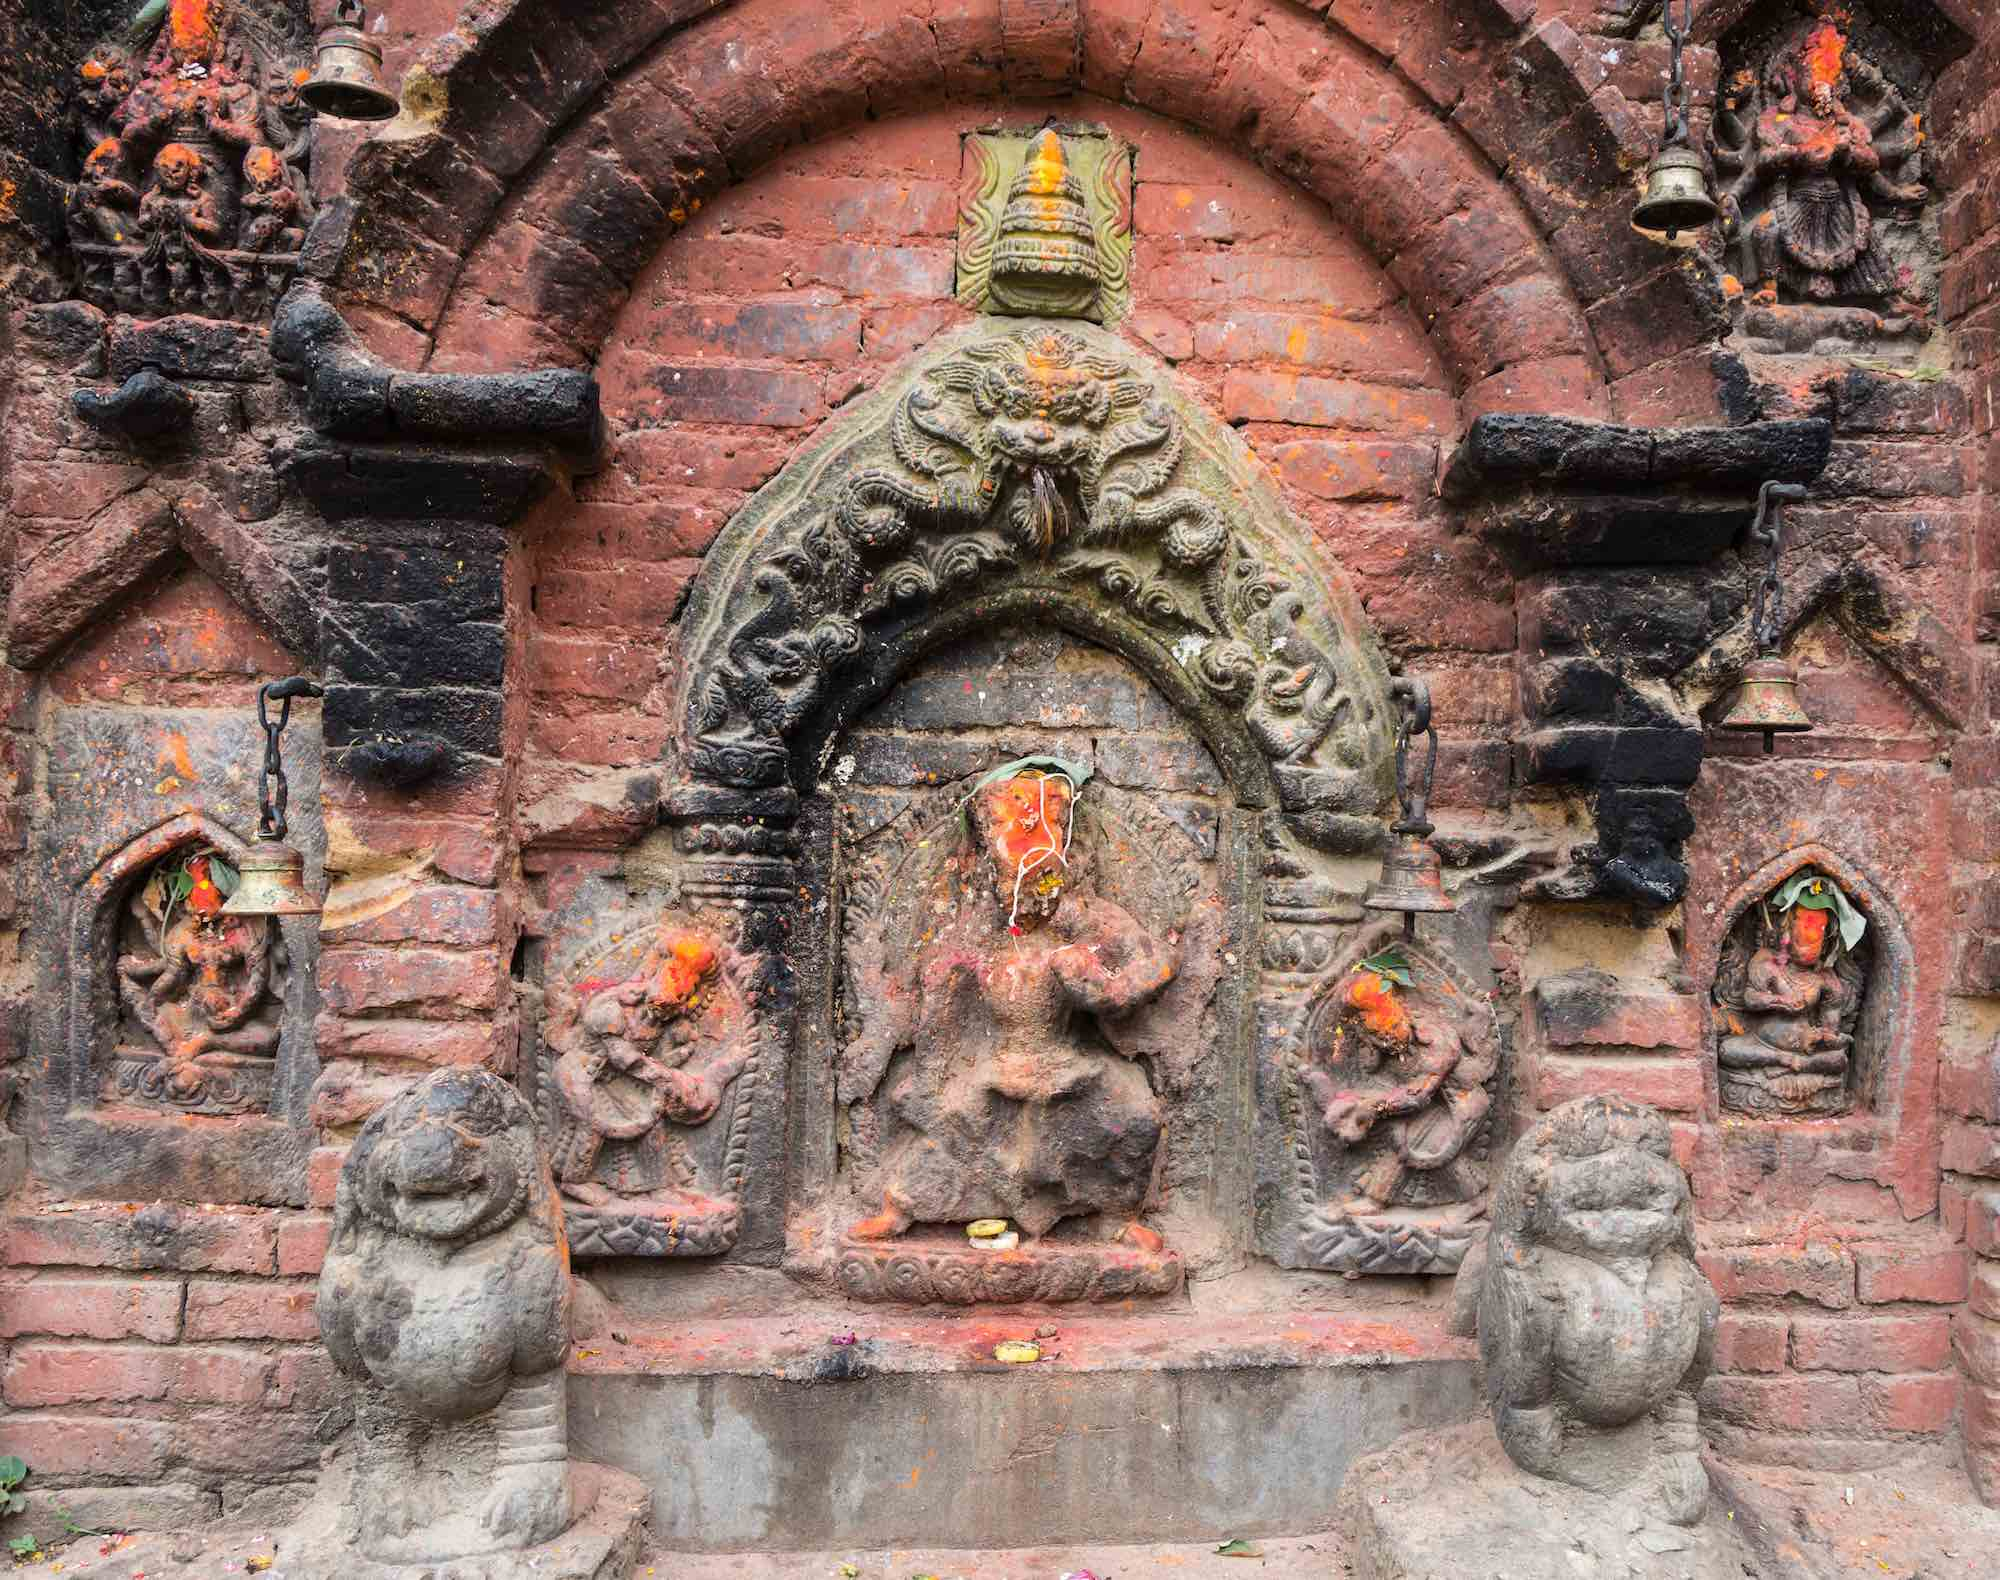 shrine Potters Square - Bhaktapur May 2018